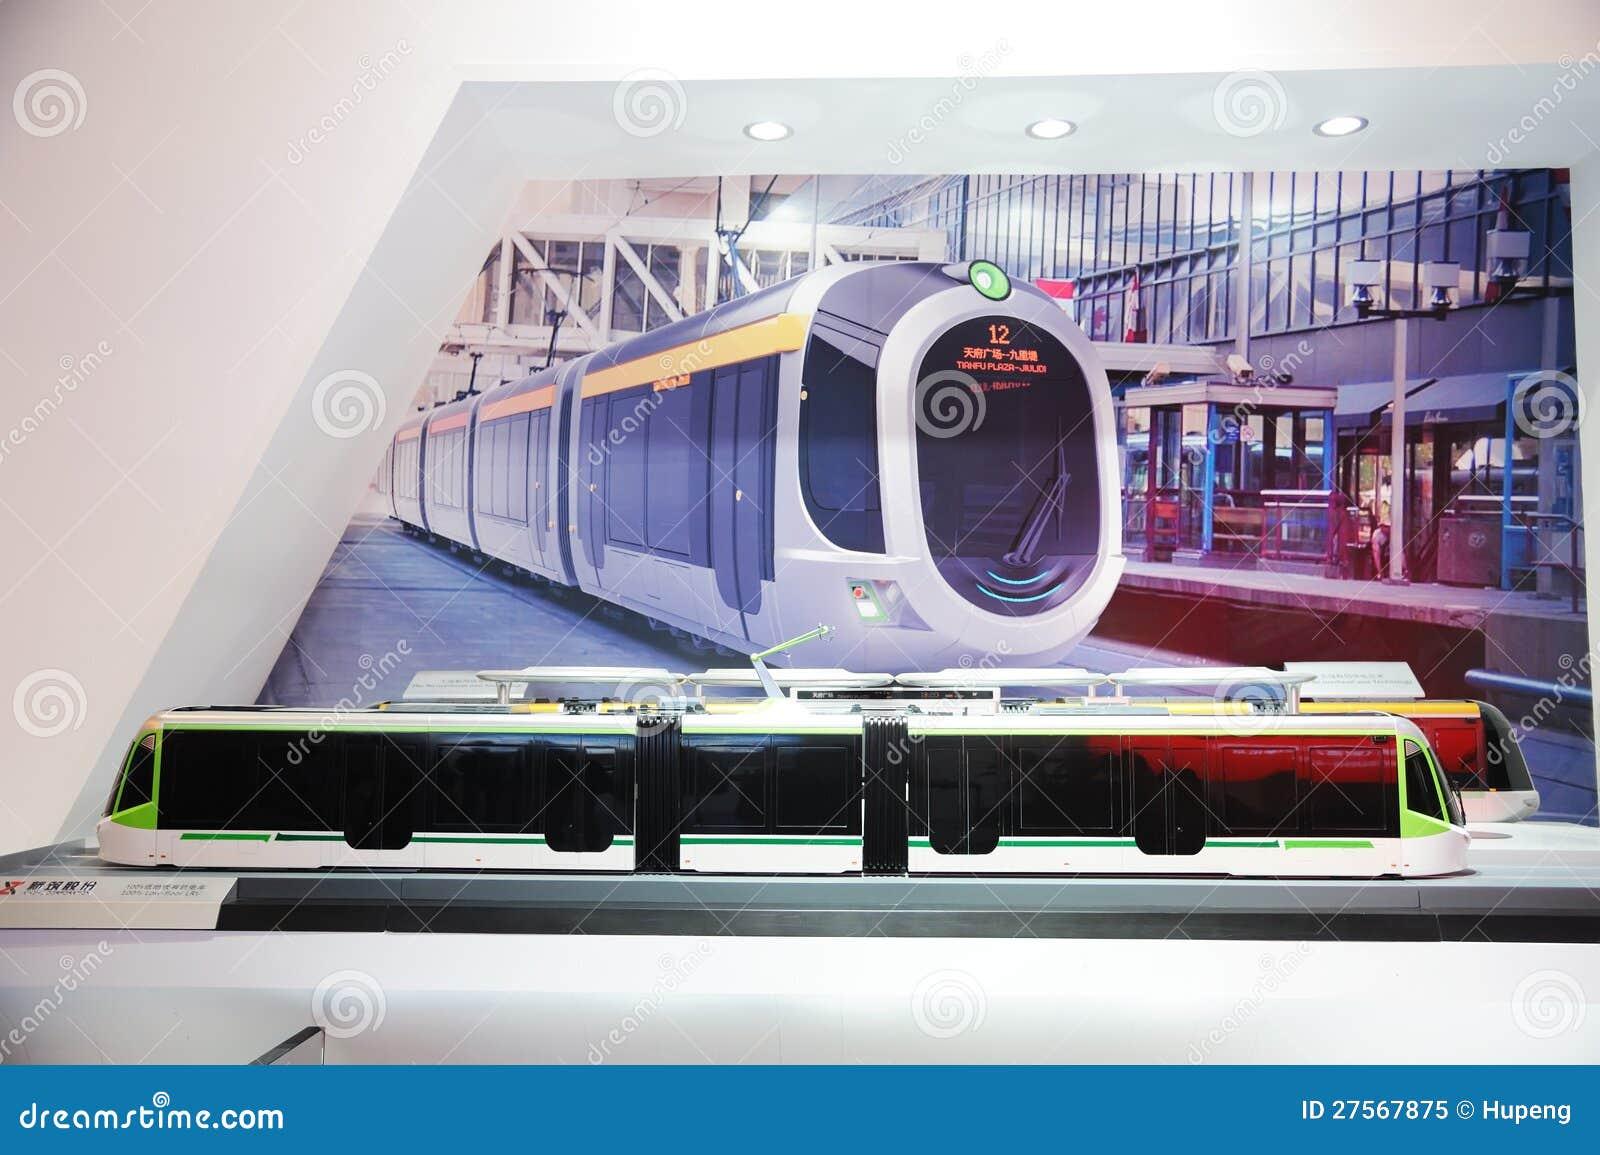 100 low floor lrv tram model editorial image image for 100 floors 29th floor